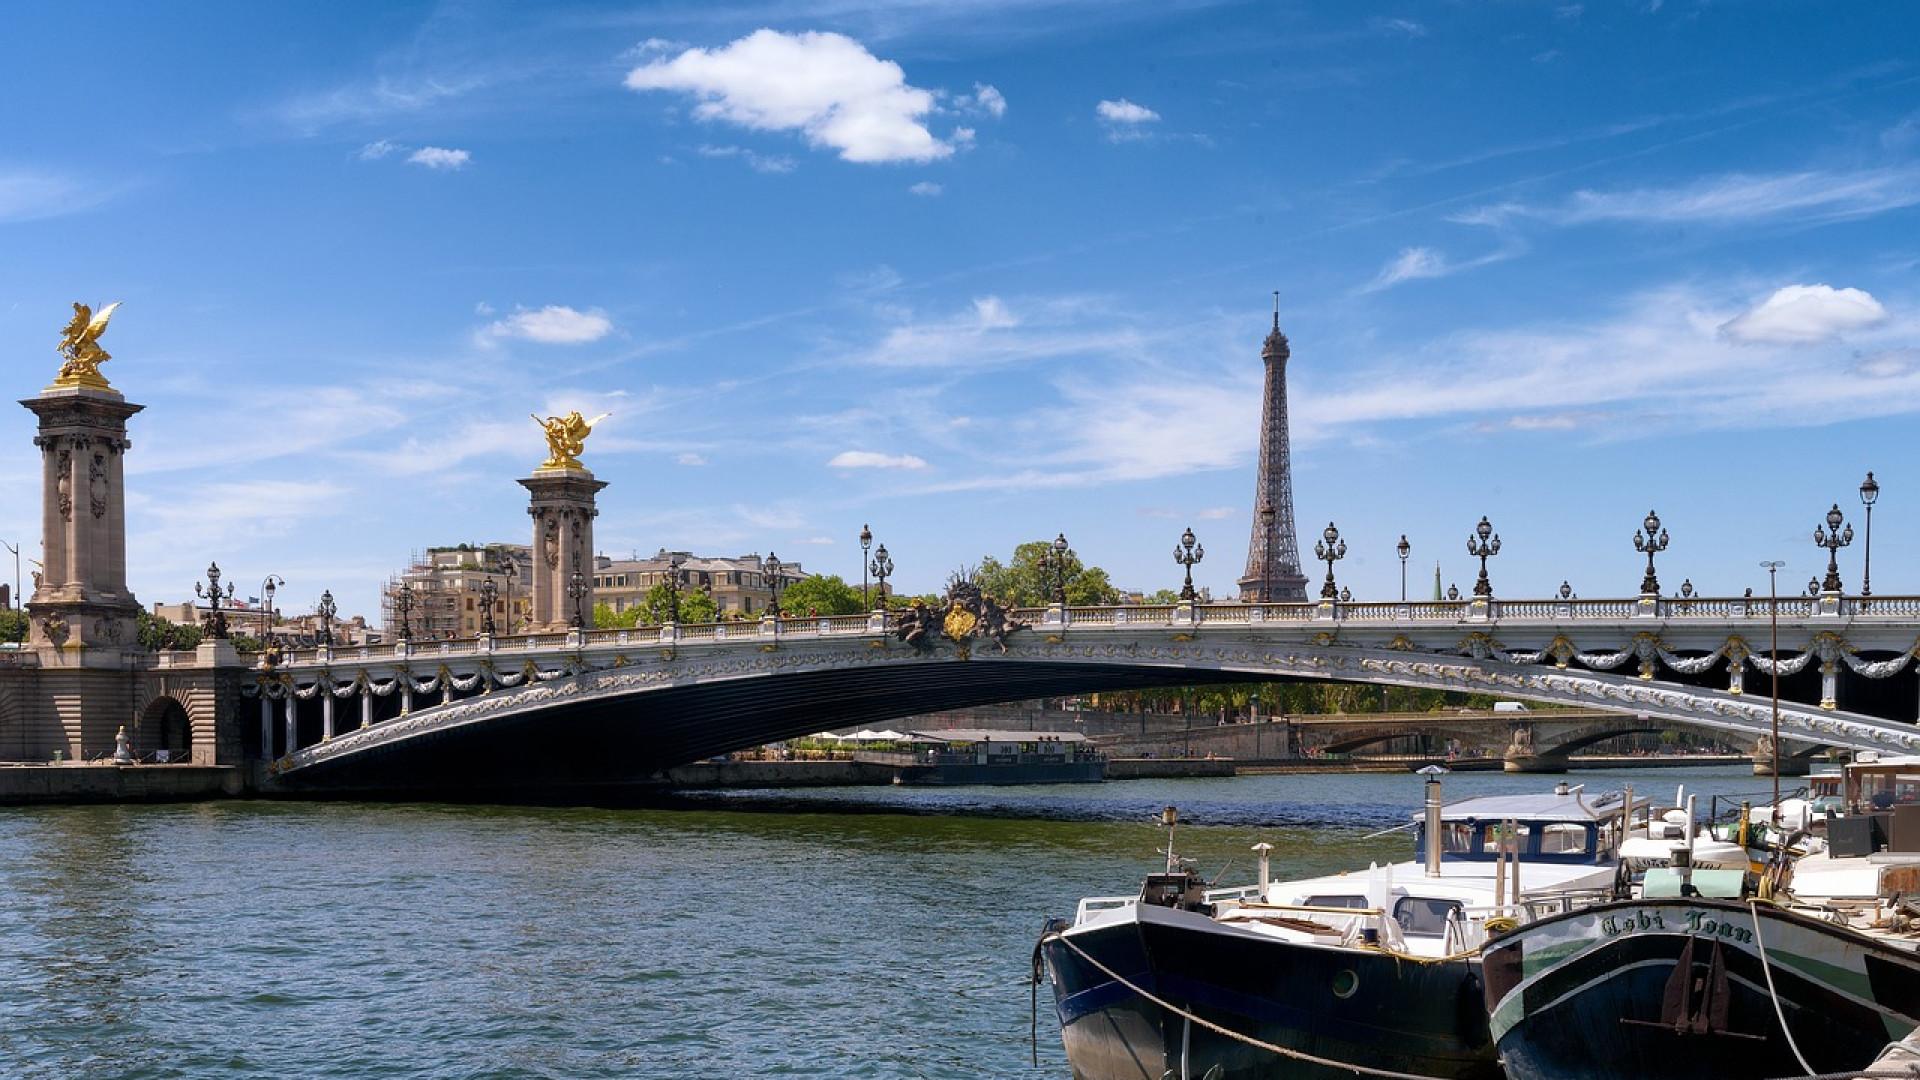 a69b21481e04bfeb3dd906b3c0b2a006 - Au fil de la Seine